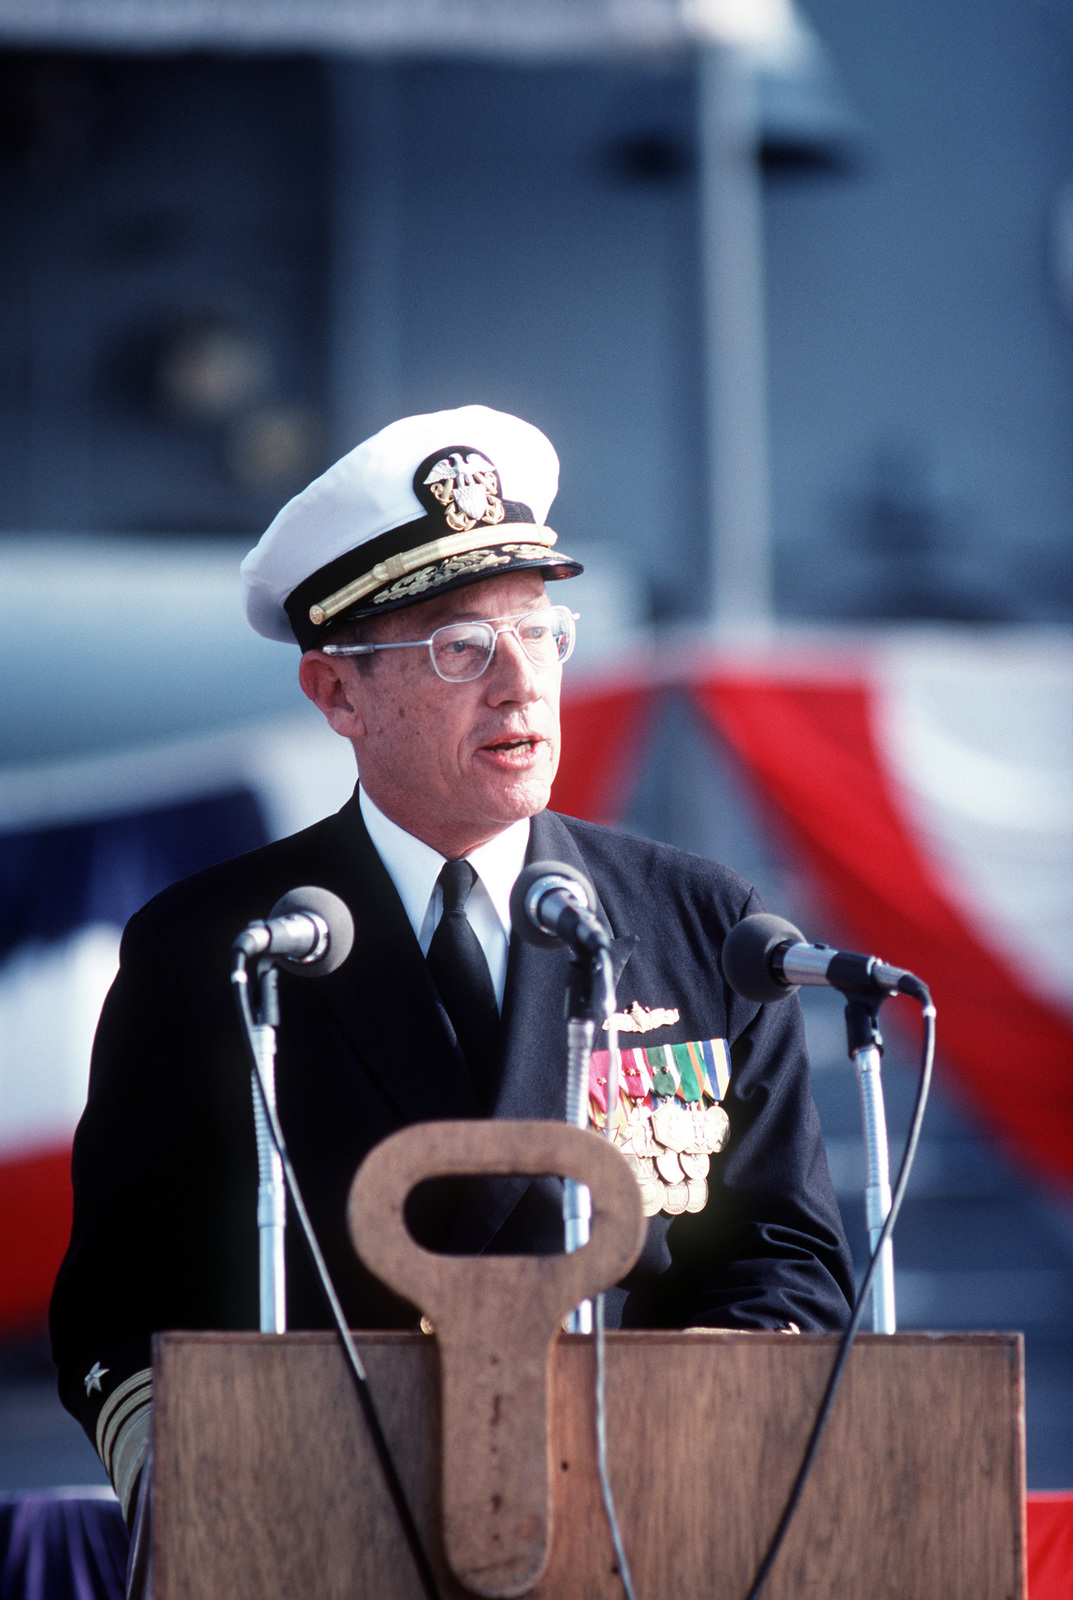 выплачивает ли адмирал х